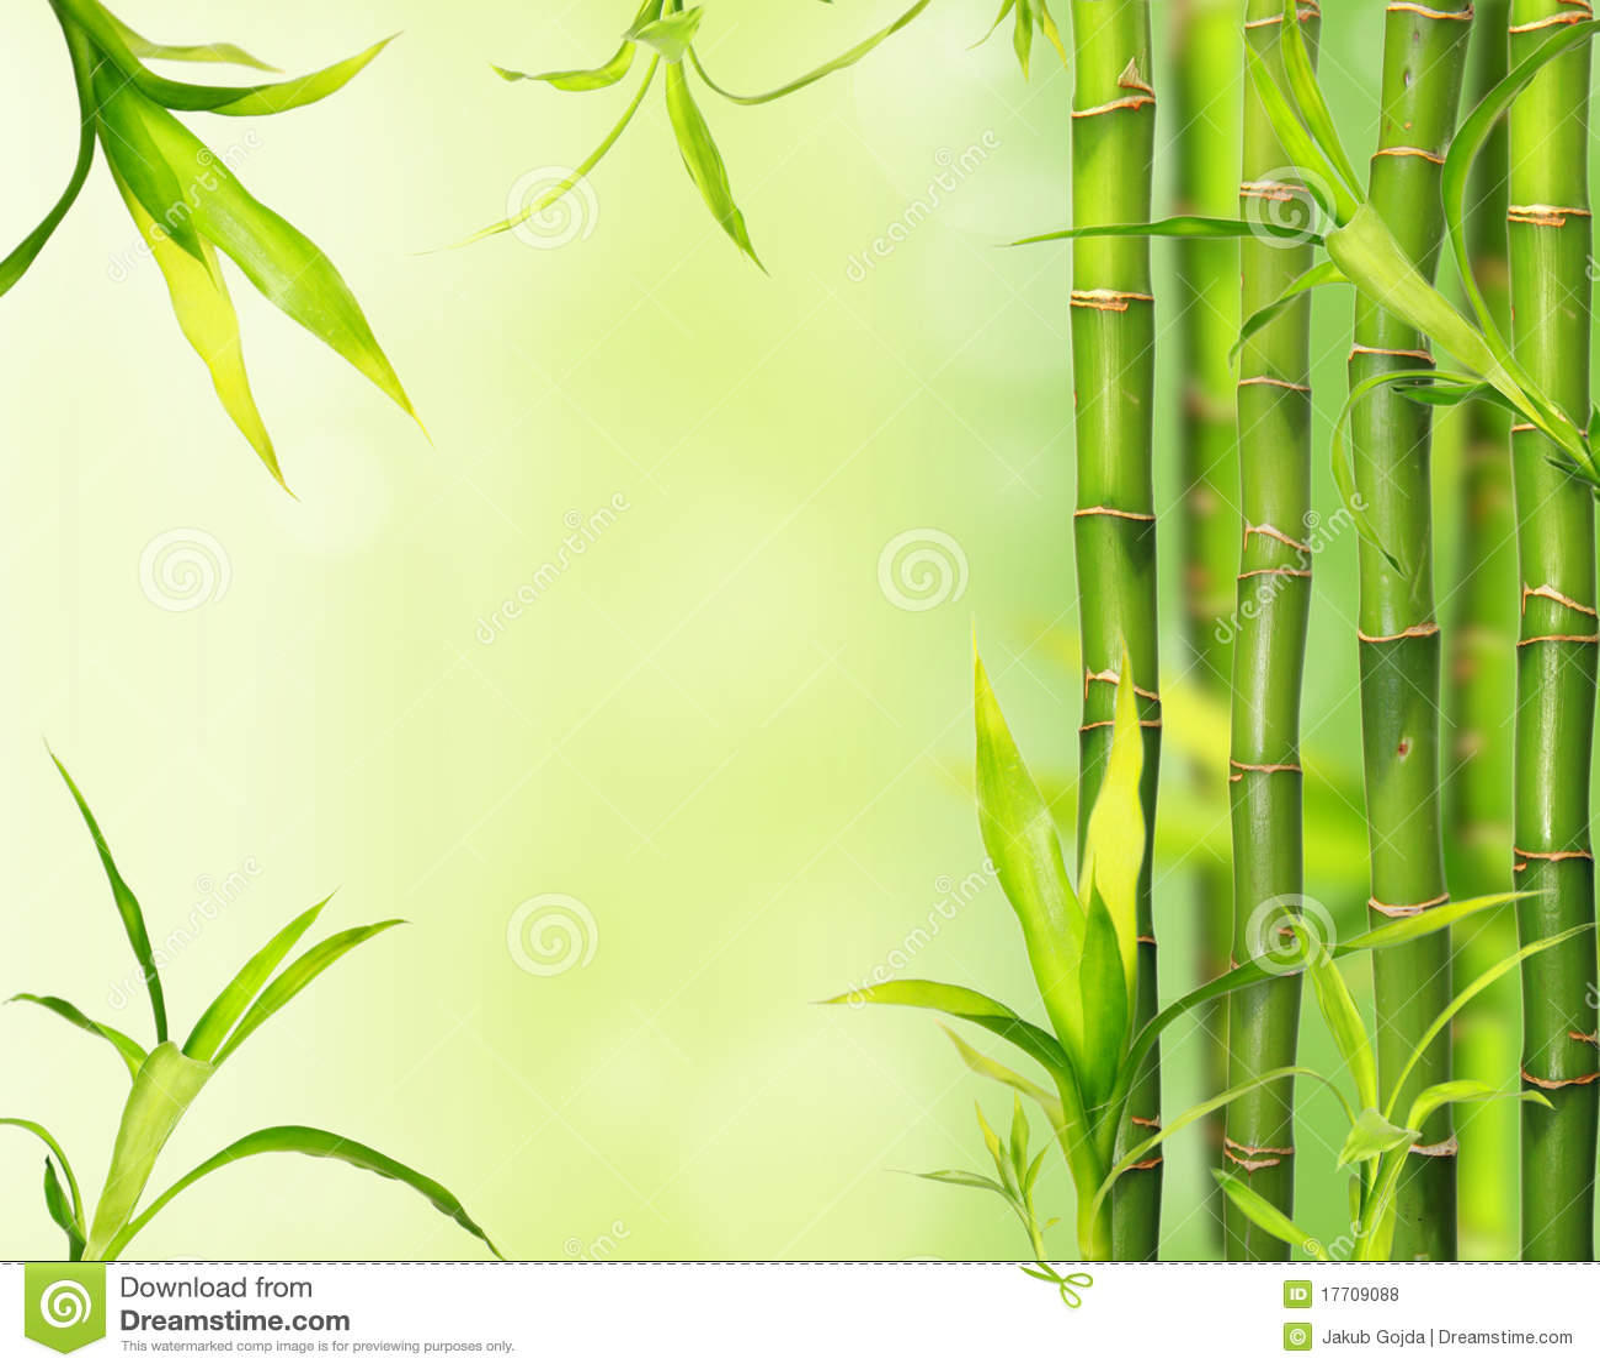 Bamboo Jungle Background Royalty Free Stock Photos Image